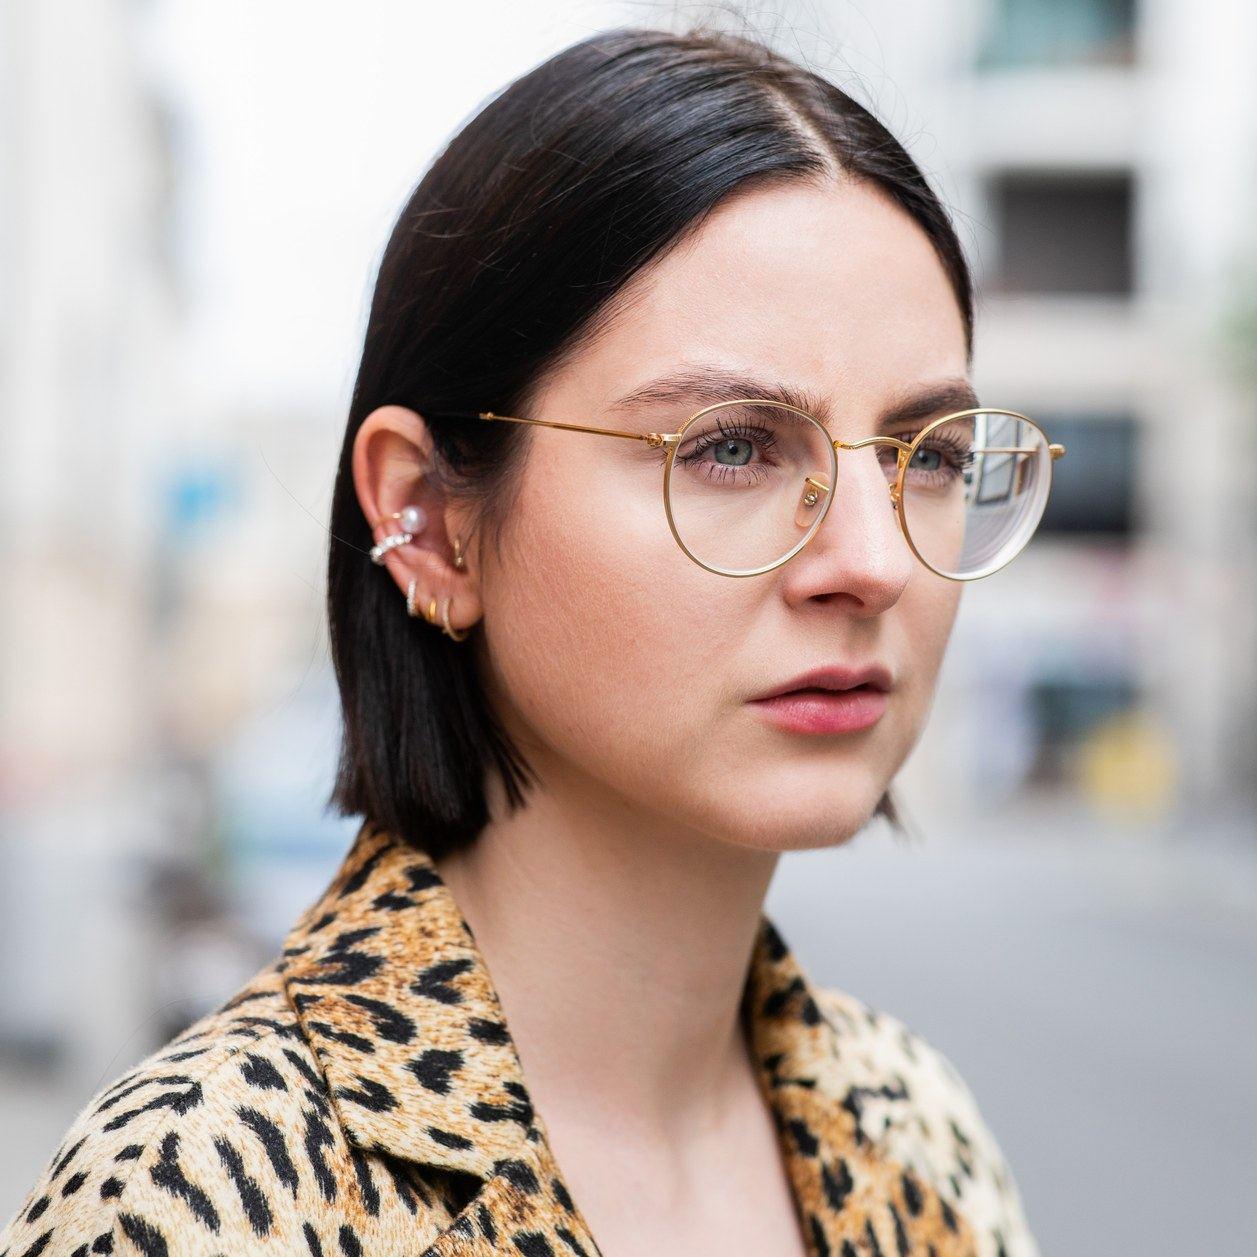 79c0c05063 Peinados para chicas con gafas